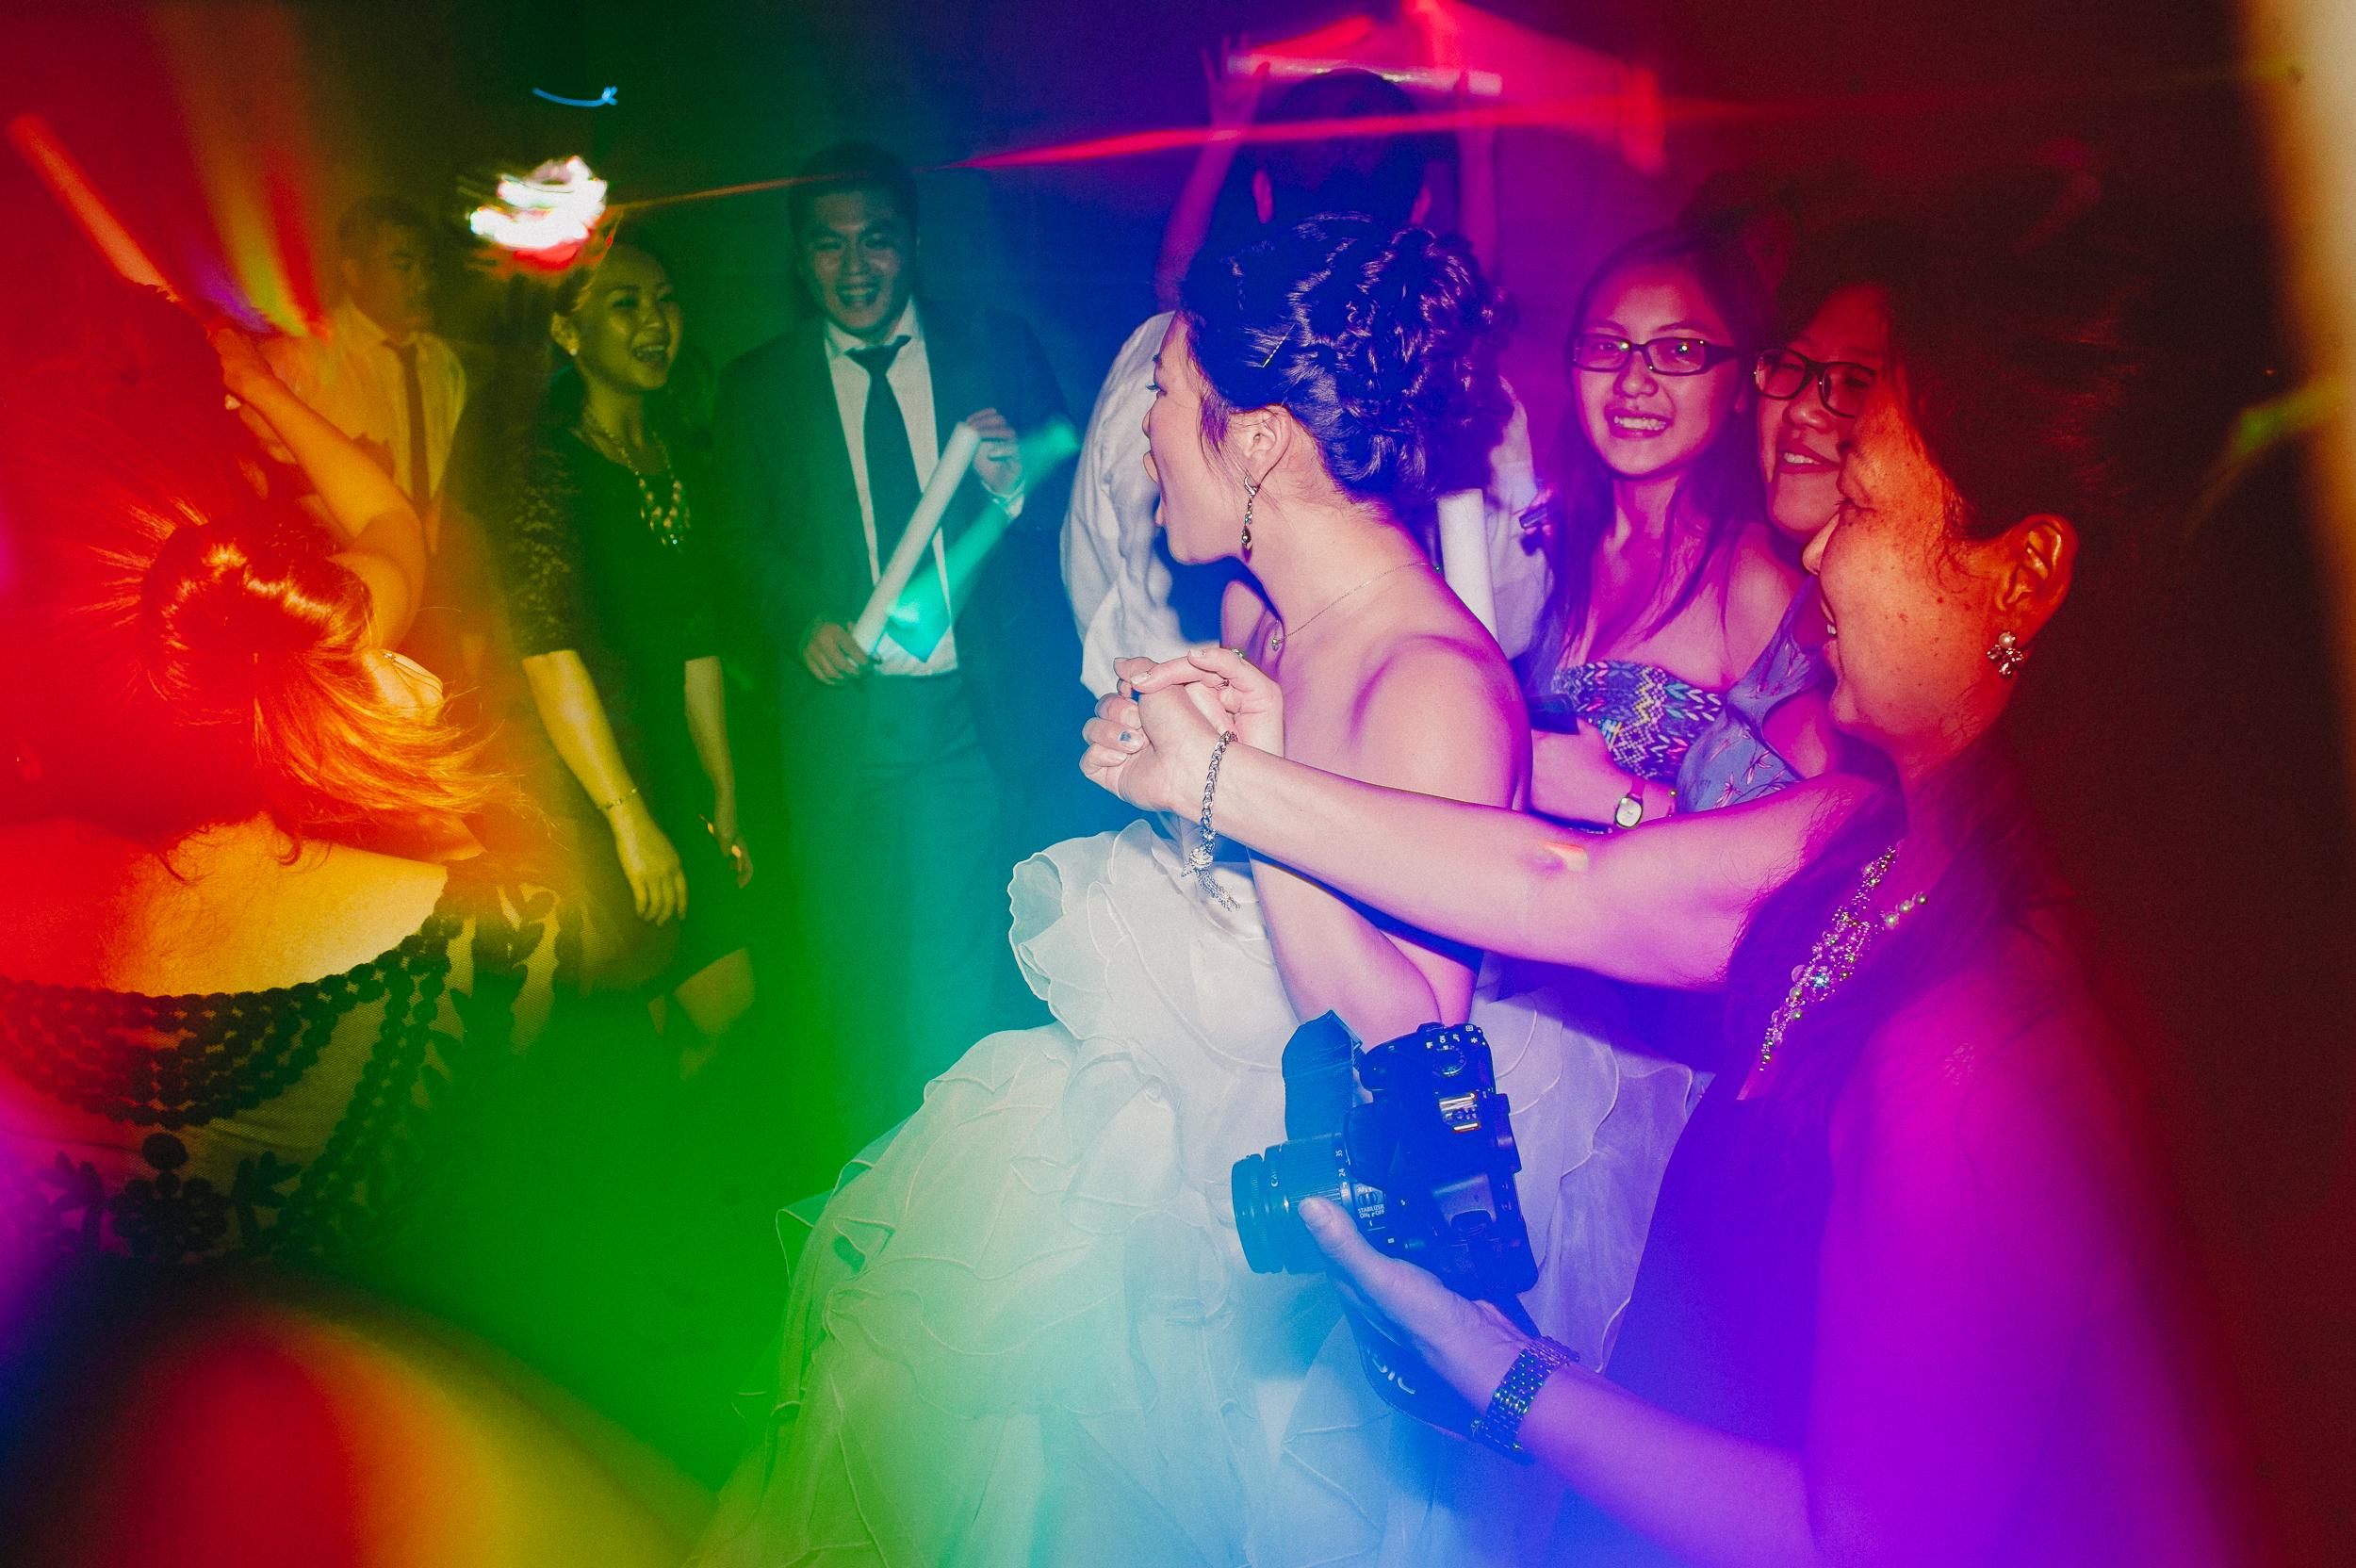 union-trust-philadelphia-wedding-photographer-76.jpg